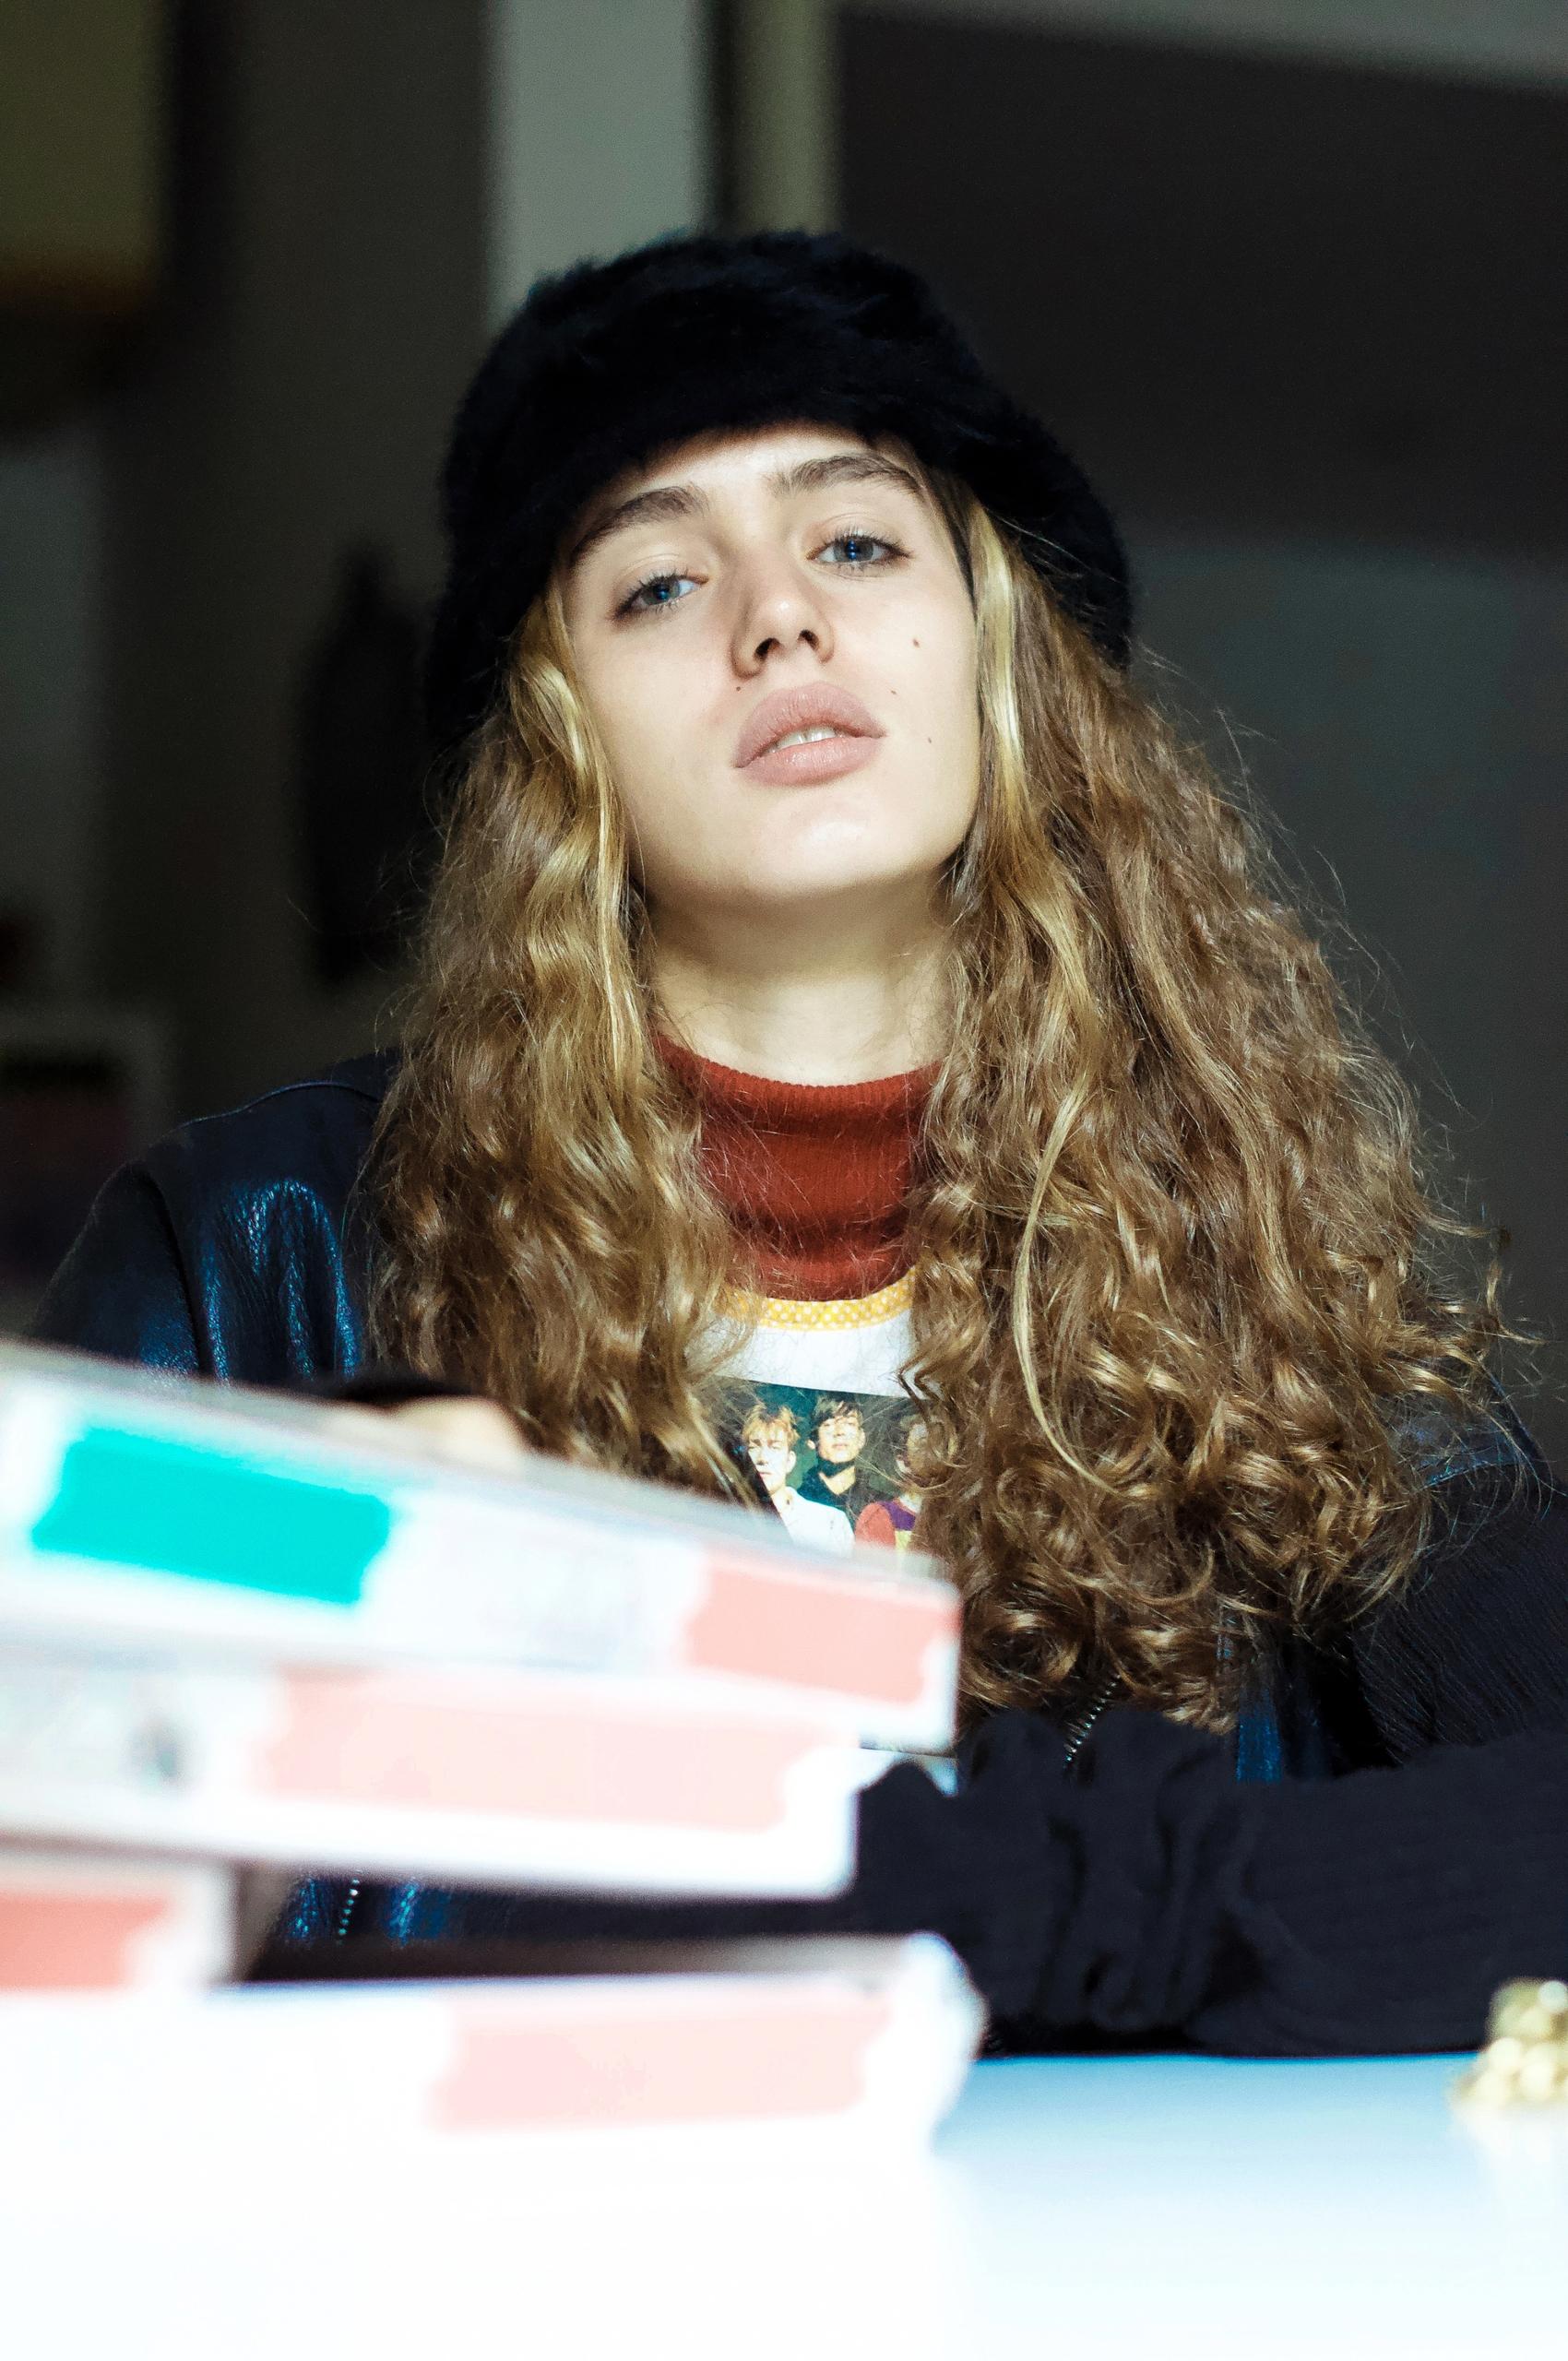 Camilla//2018 - photography, portrait - matildes | ello